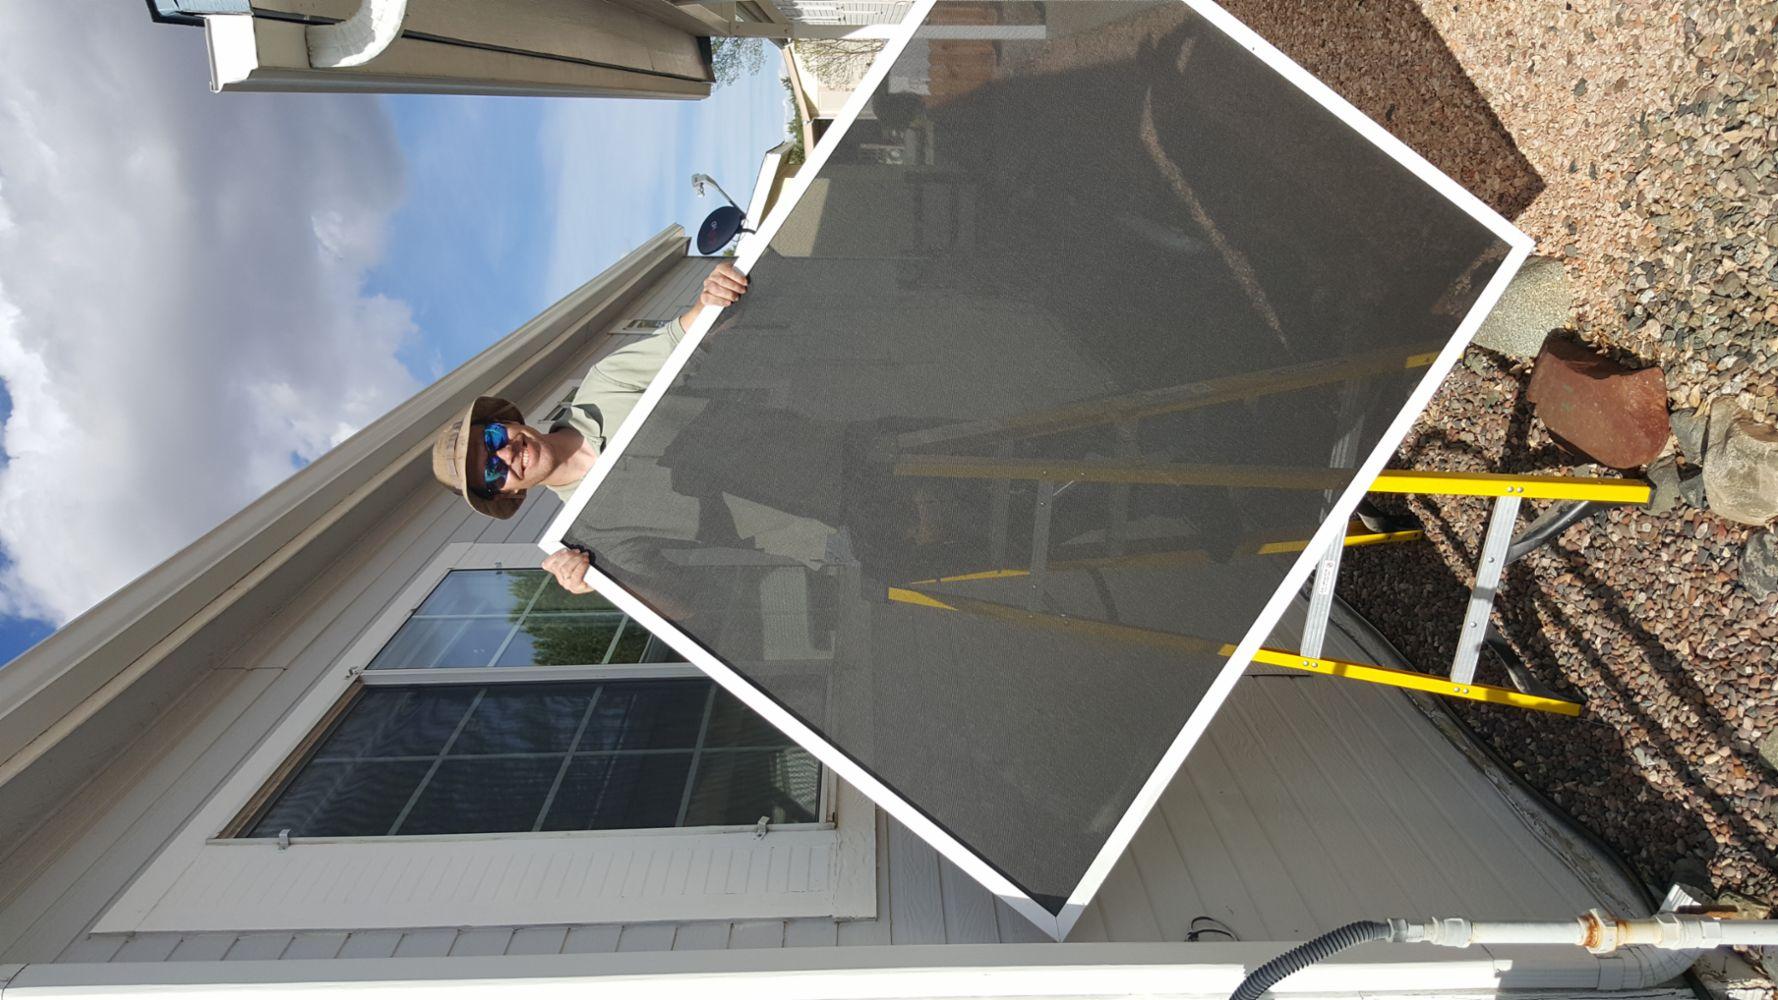 Window screen repair and installation in prescott valley for Home window screen repair